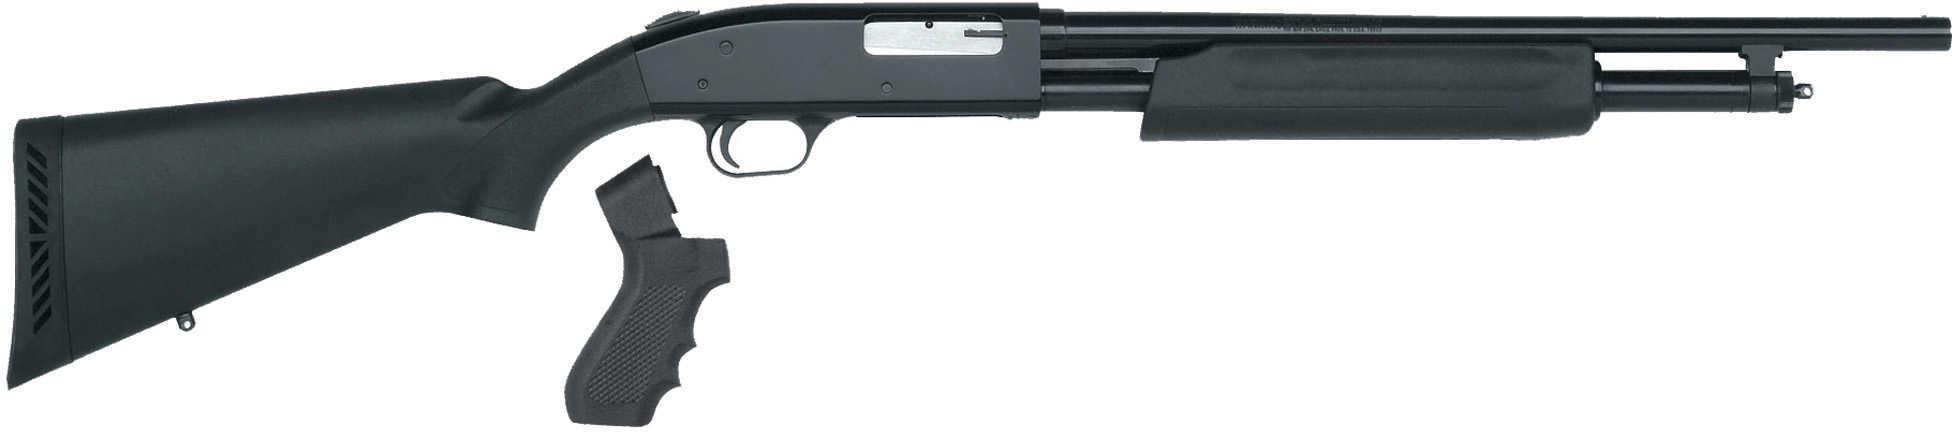 "Mossberg 500 Persuader 20 Gauge Shotgun 18.5""Barrel 6 Round Shotgun 50452"